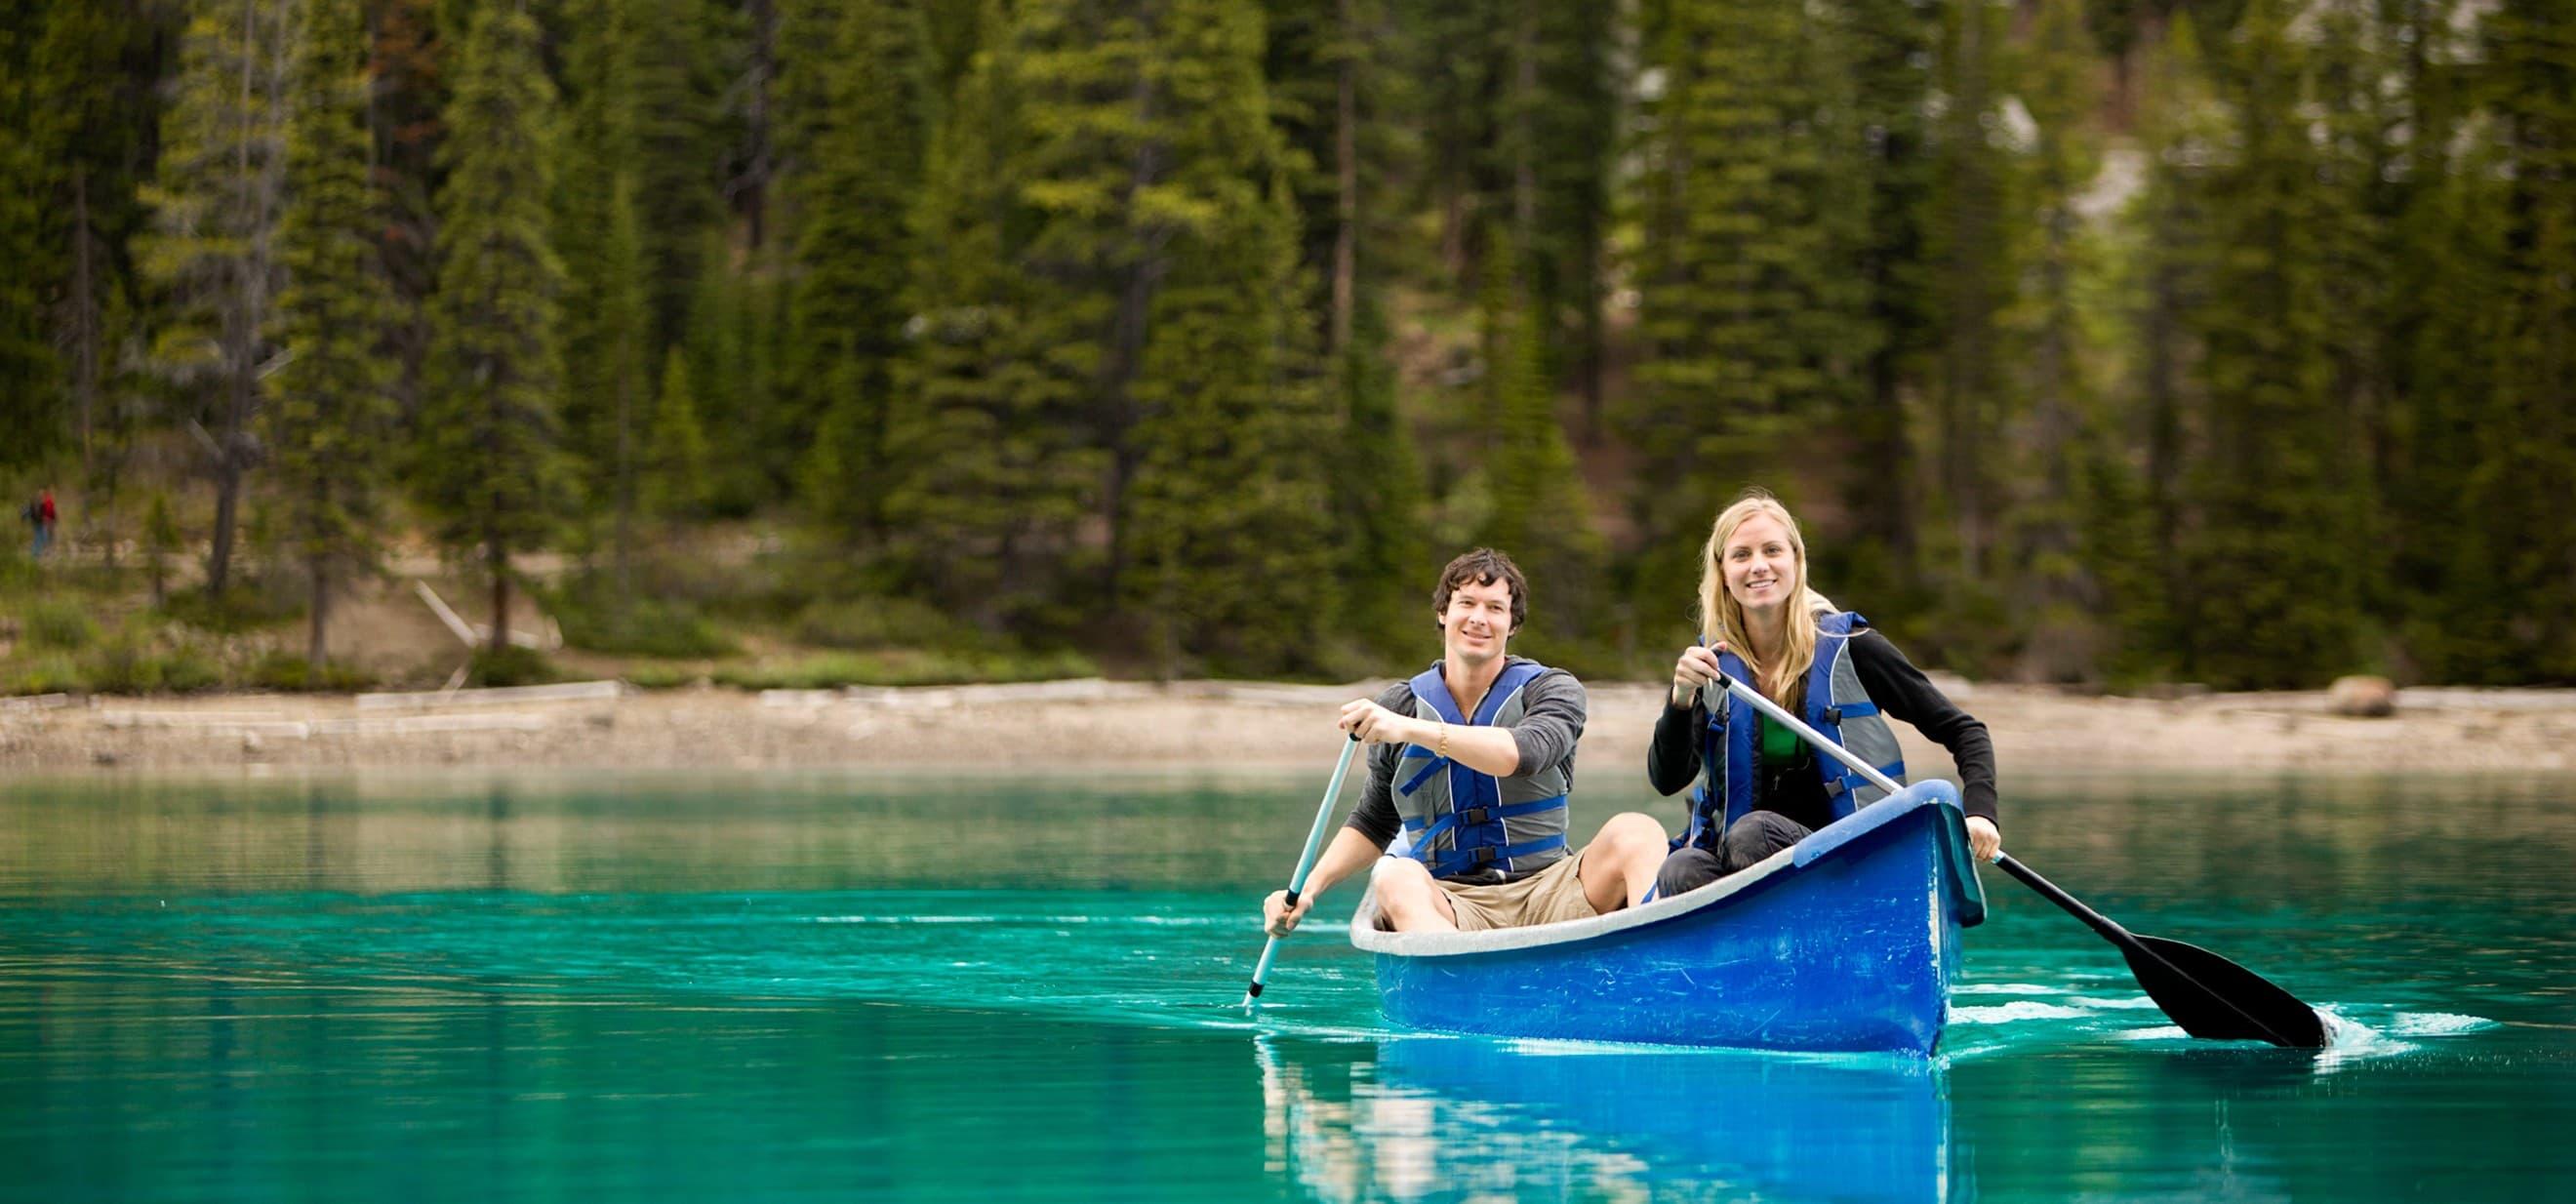 romantic couple rowing on lake